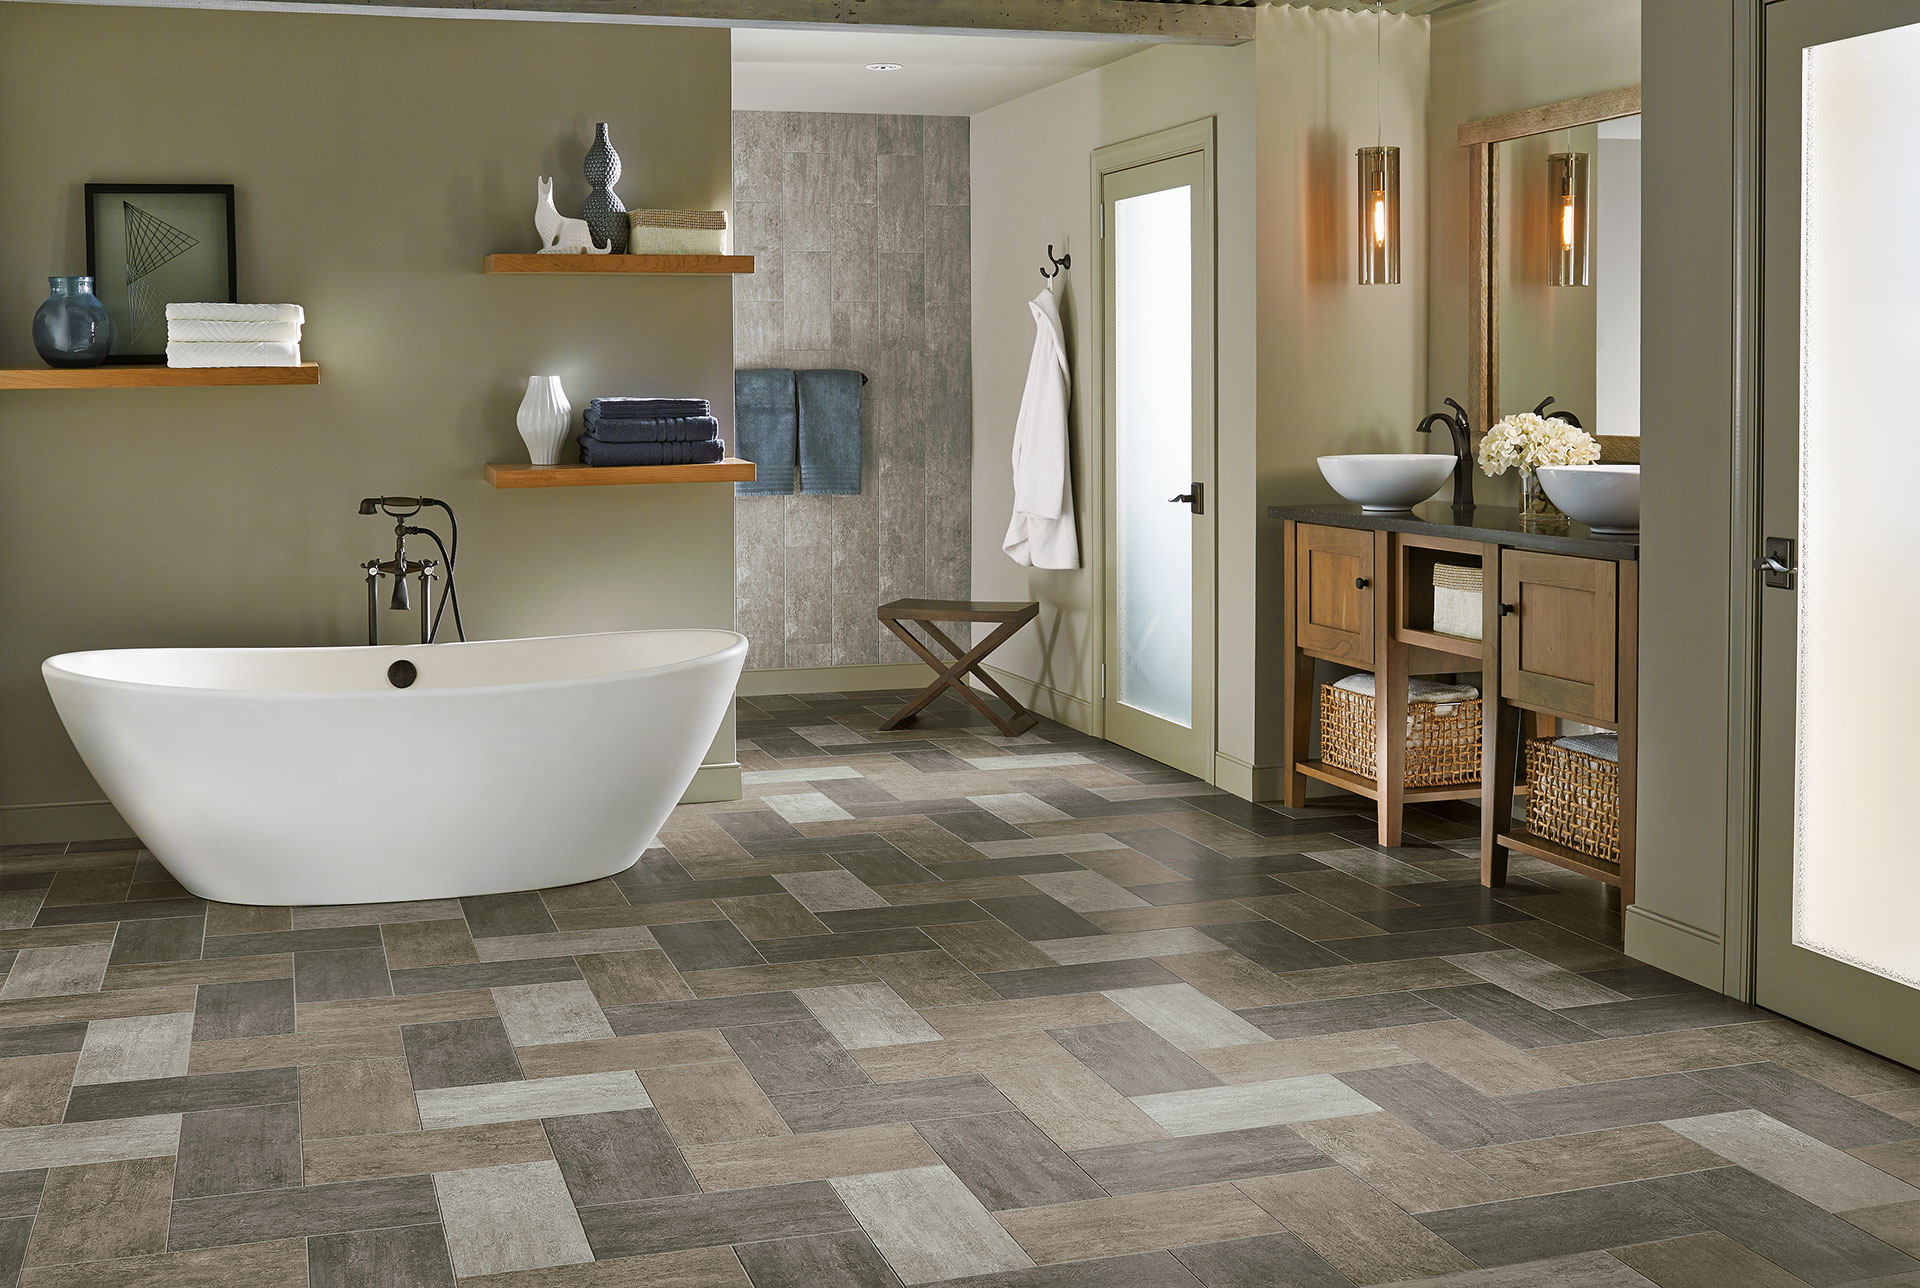 Tile toma fine floors tiles07 doublecrazyfo Choice Image